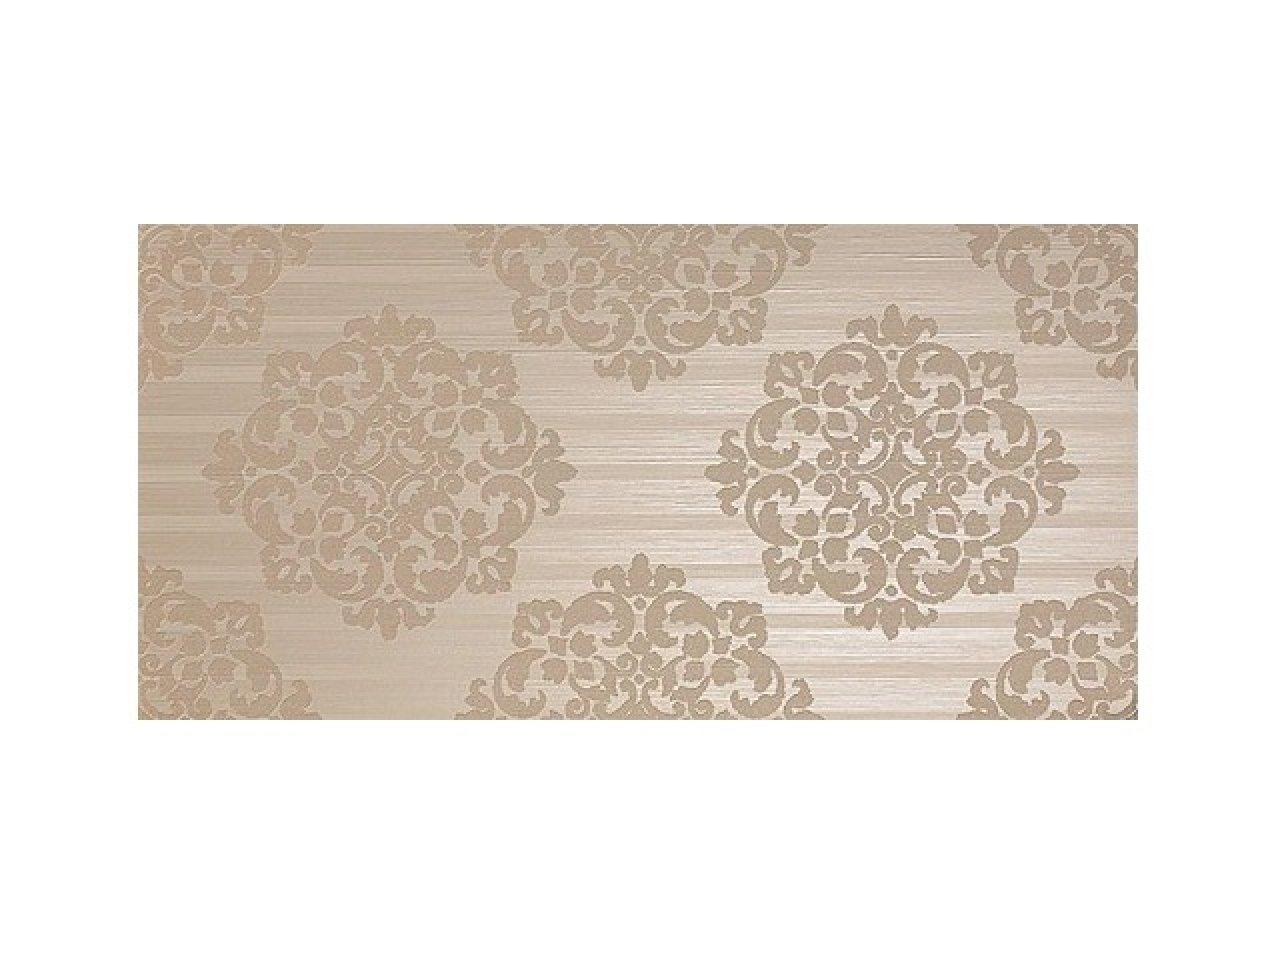 Настенная плитка Brilliant Sable Damasque 40x80